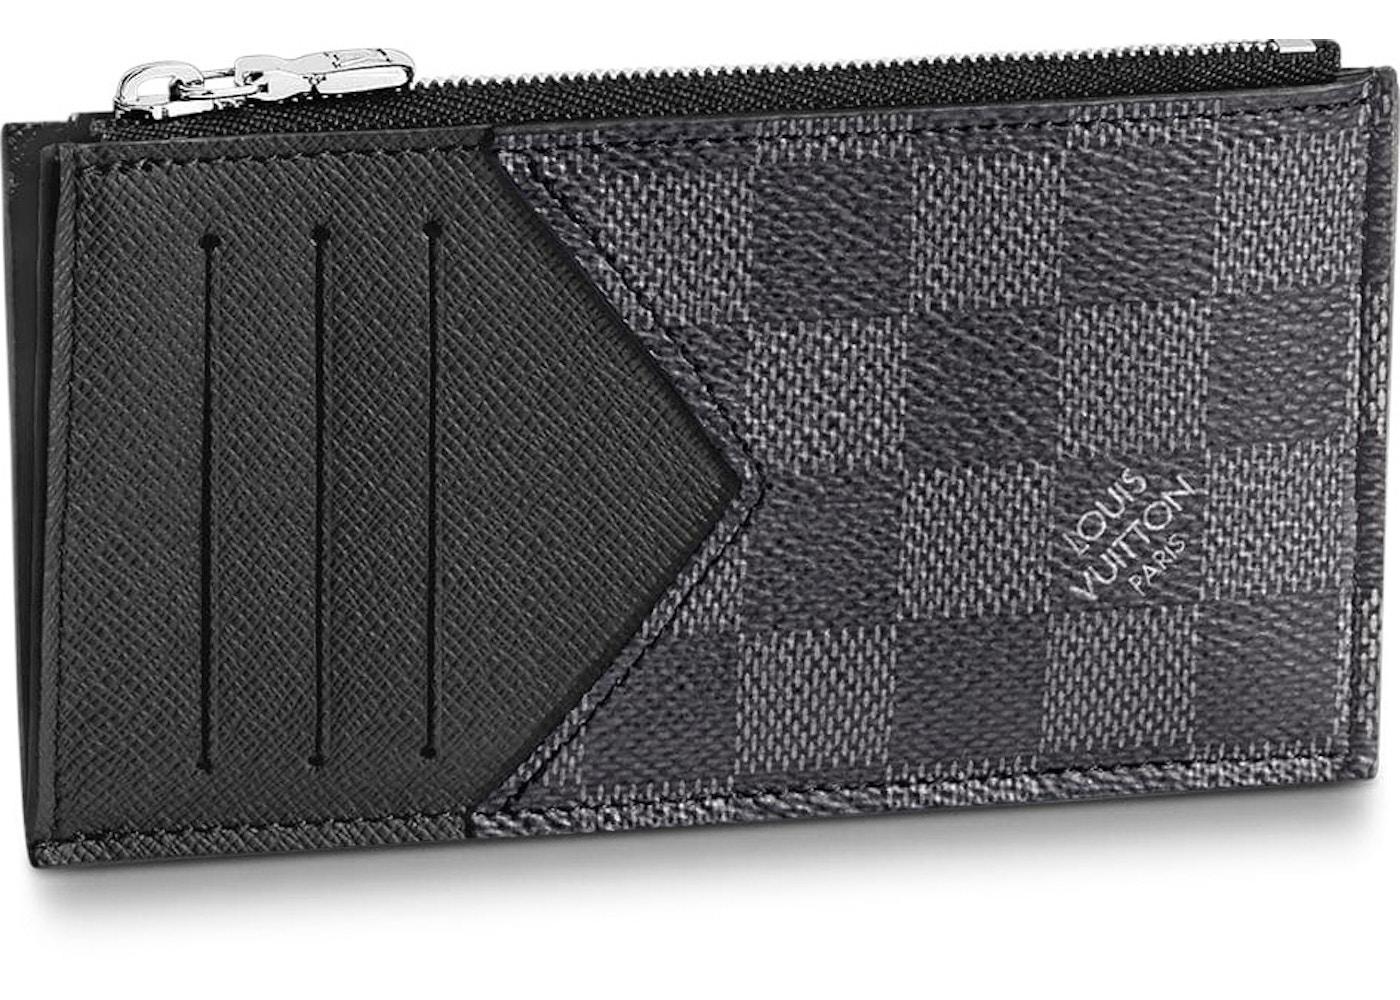 188b83104d99 Louis Vuitton Coin Card Holder Damier Graphite Grey Black. Damier Graphite  Grey Black